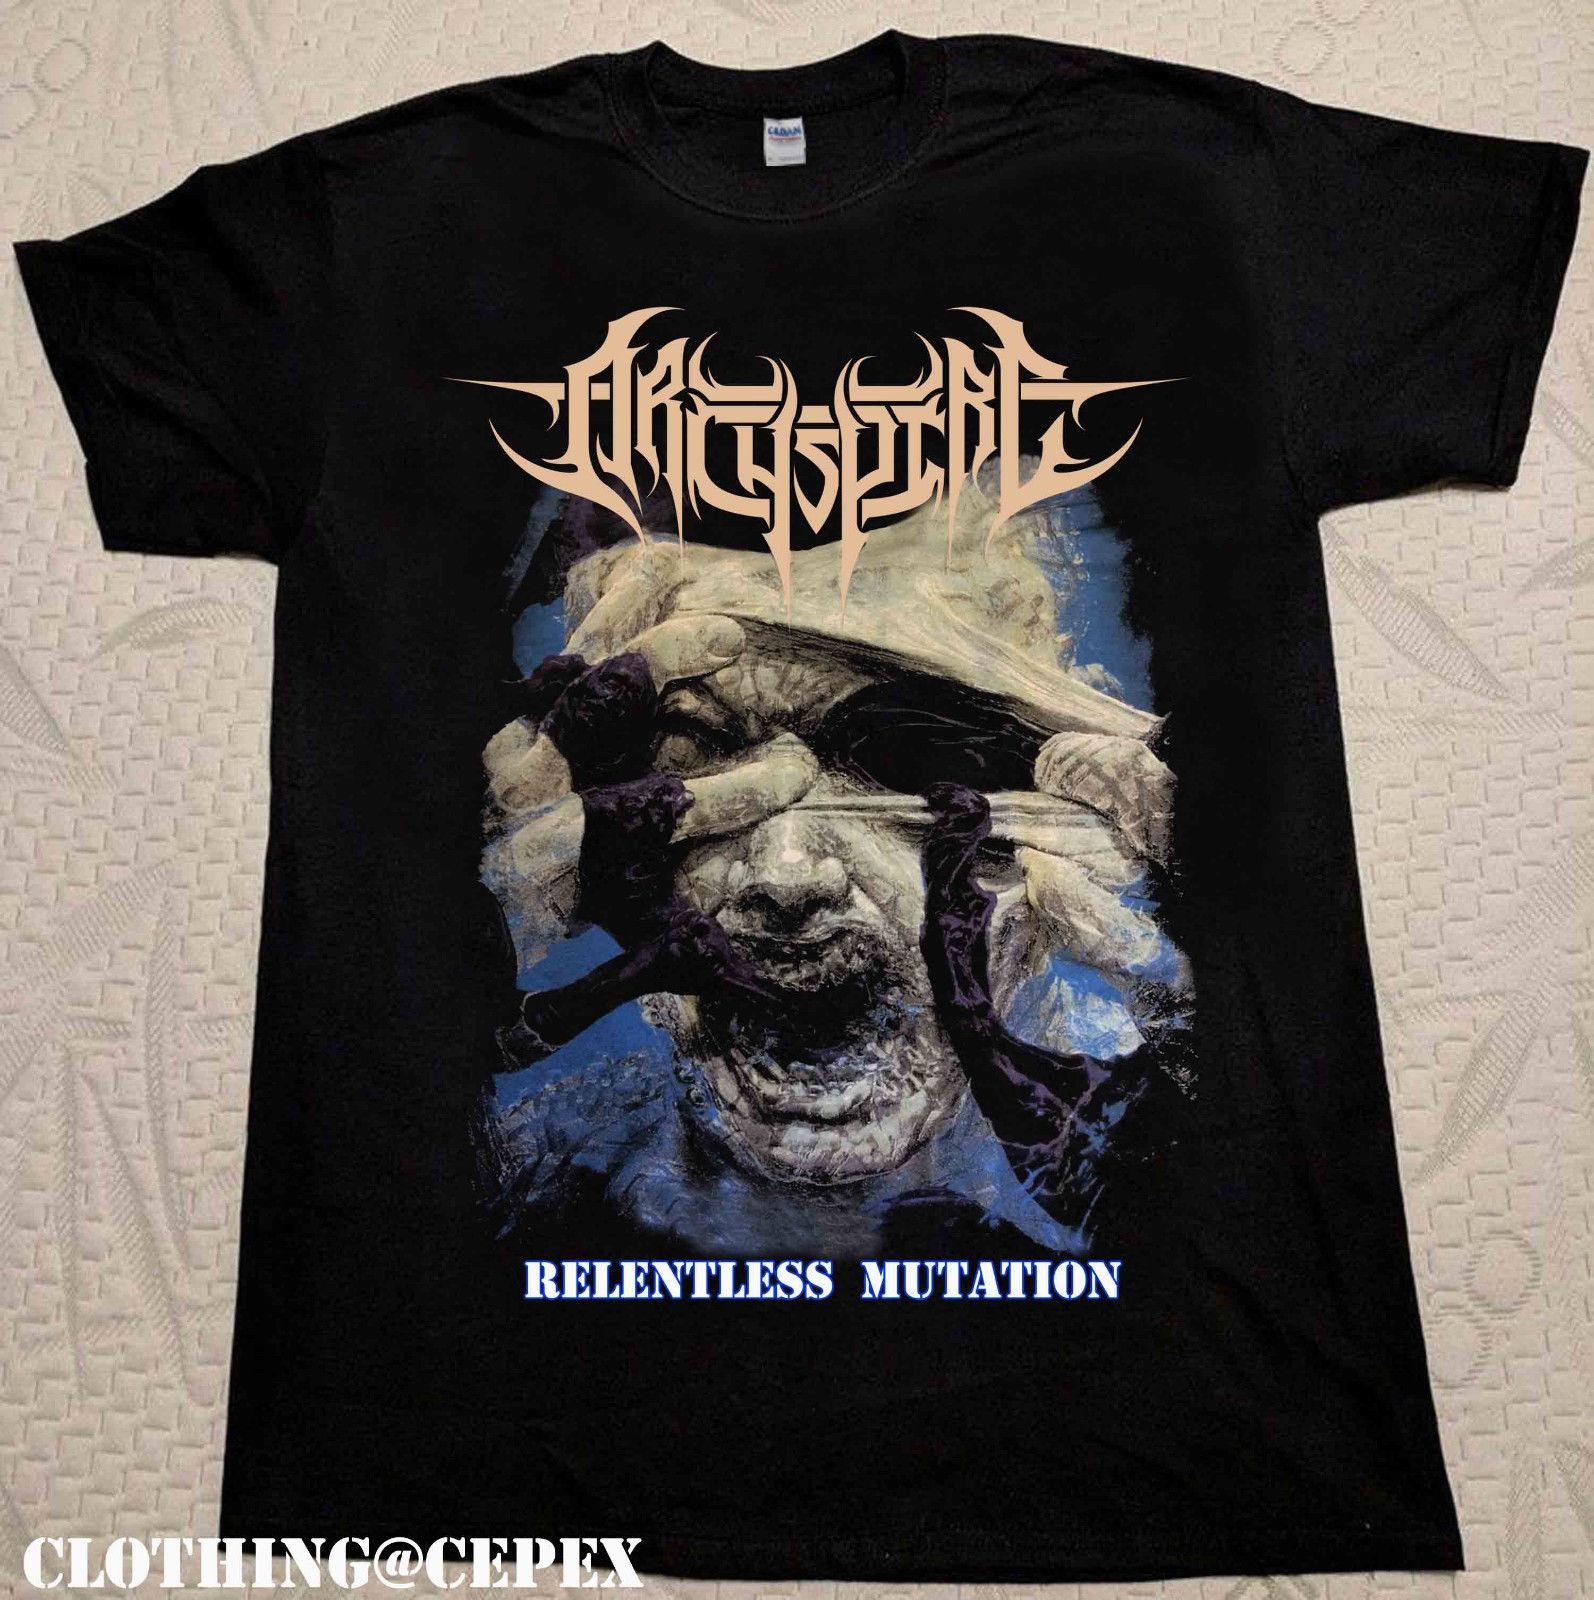 891de466 Rare Archspire Relentless Mutation T Shirt New Short Sleeve Black S 3xl Hot  Selling 100 % Cotton T Shirts Top Tee Plus Size Interesting T Shirts T  Shirt Buy ...